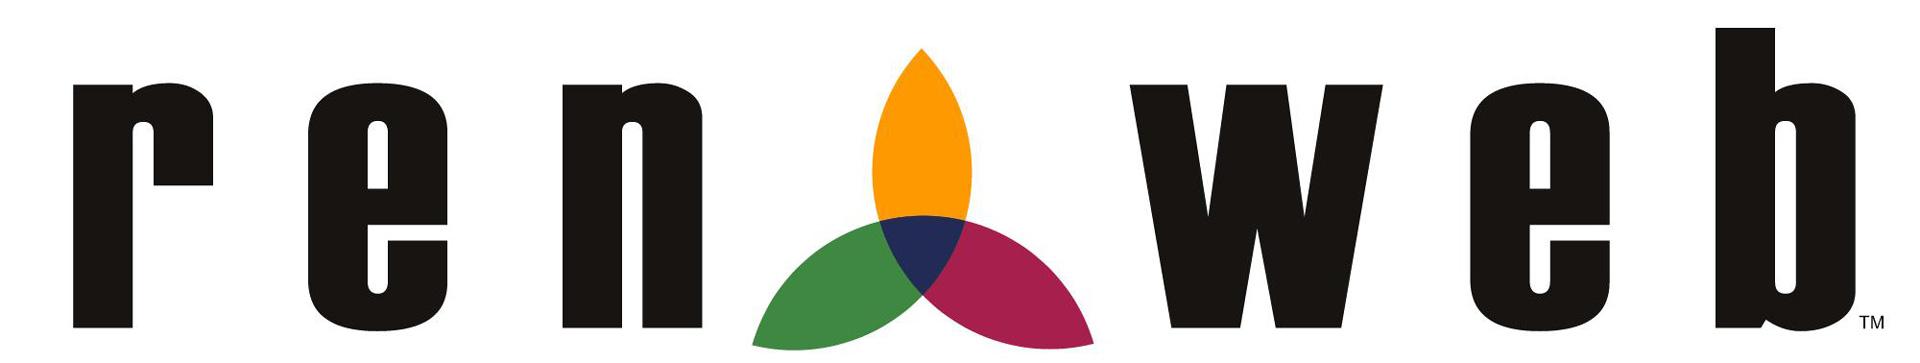 renweb-logo